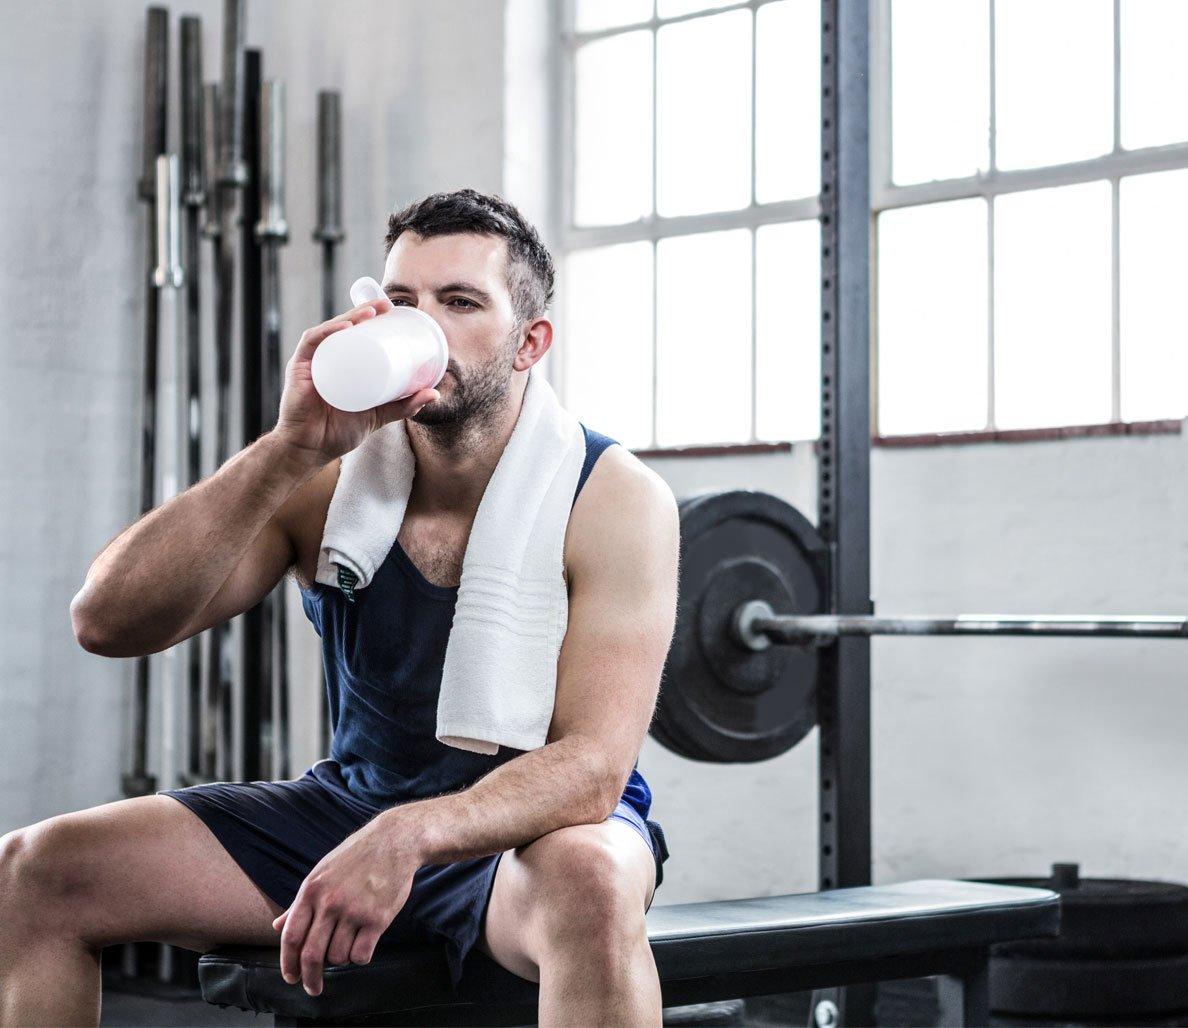 bevande proteiche fatte in casa per dimagrire